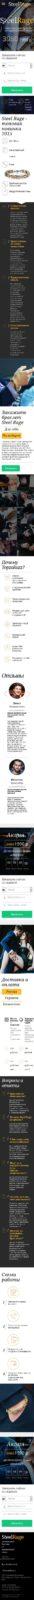 Скриншот Лендинга Браслет Steel Rage 001 - моб